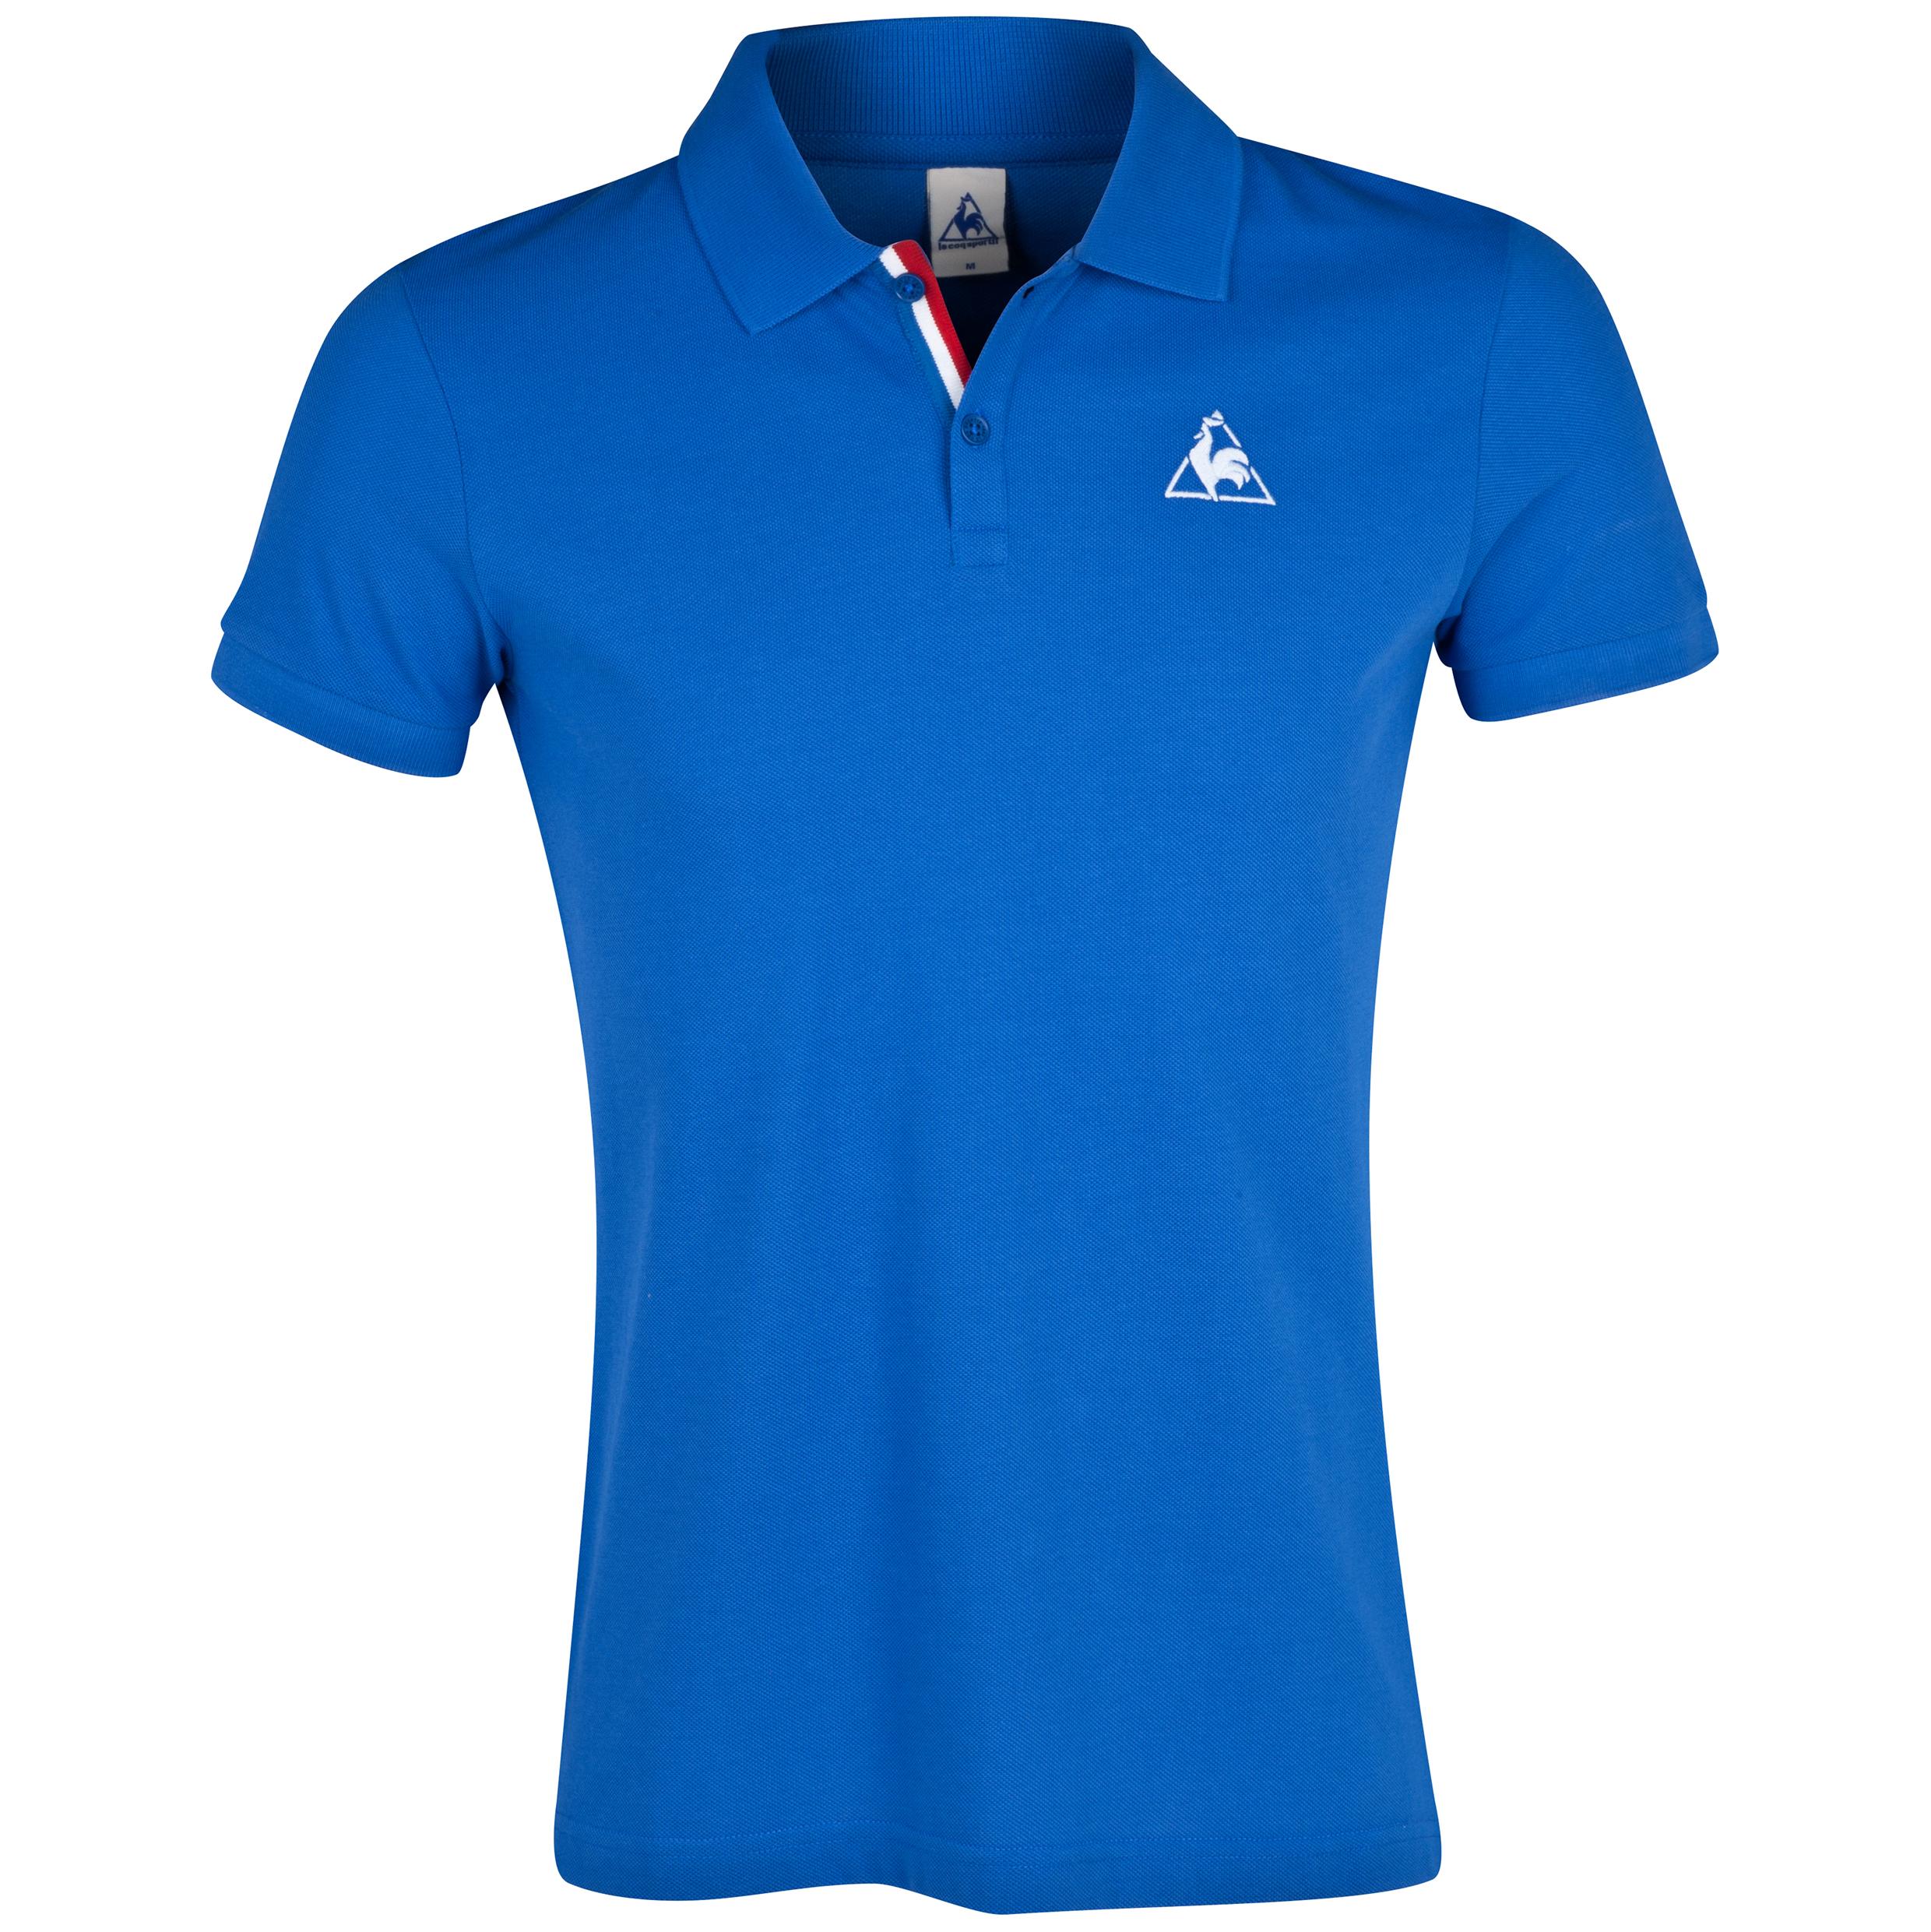 Le Coq Sportif Aspot Polo - Olympian Blue